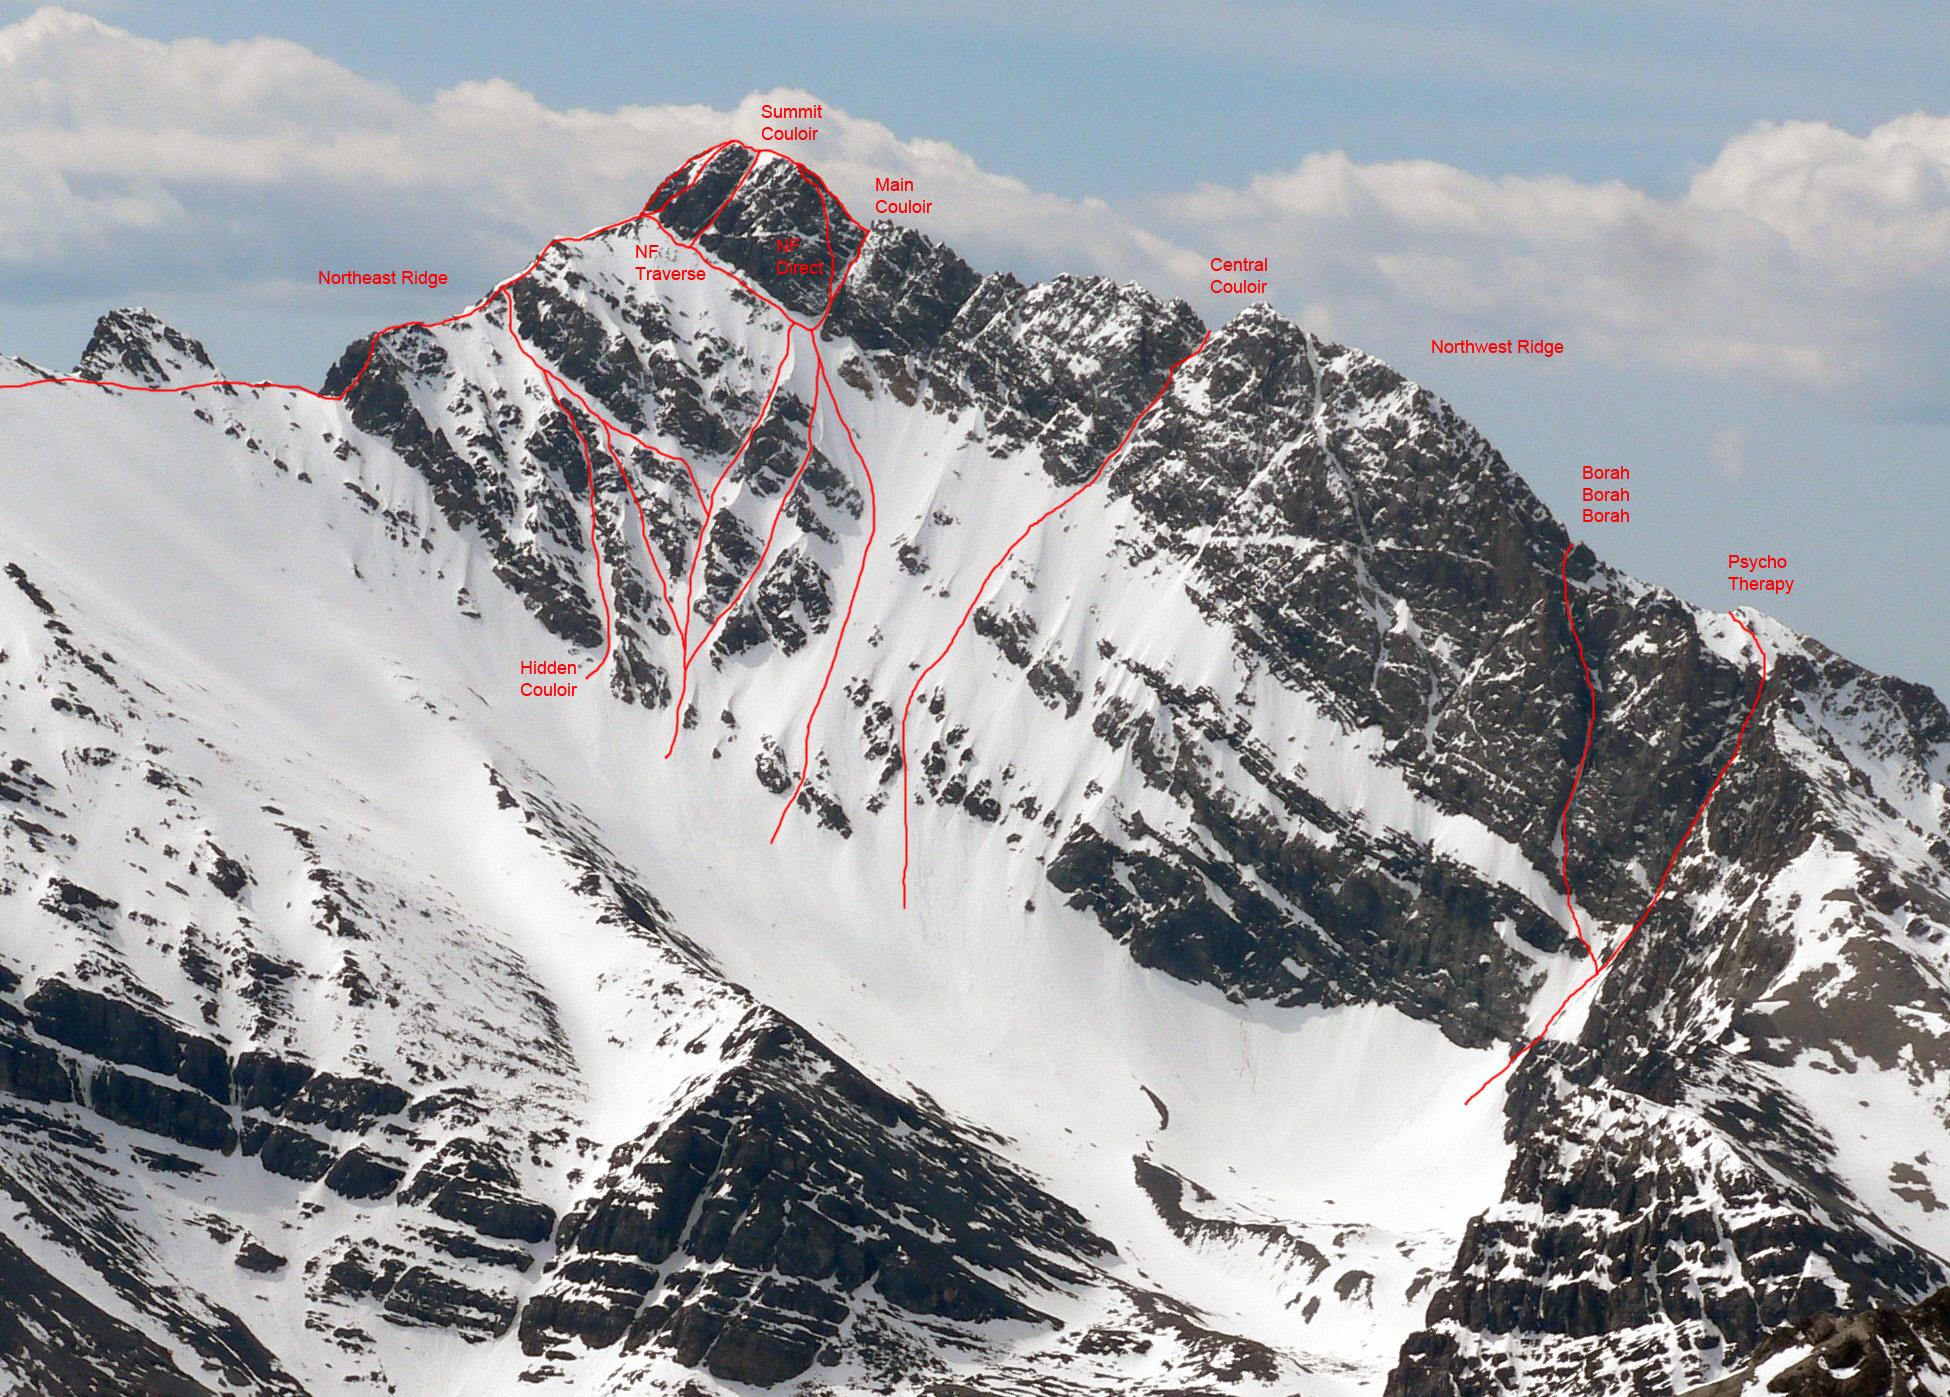 Mount Borah North Face routes. Photo - Dan Robbins